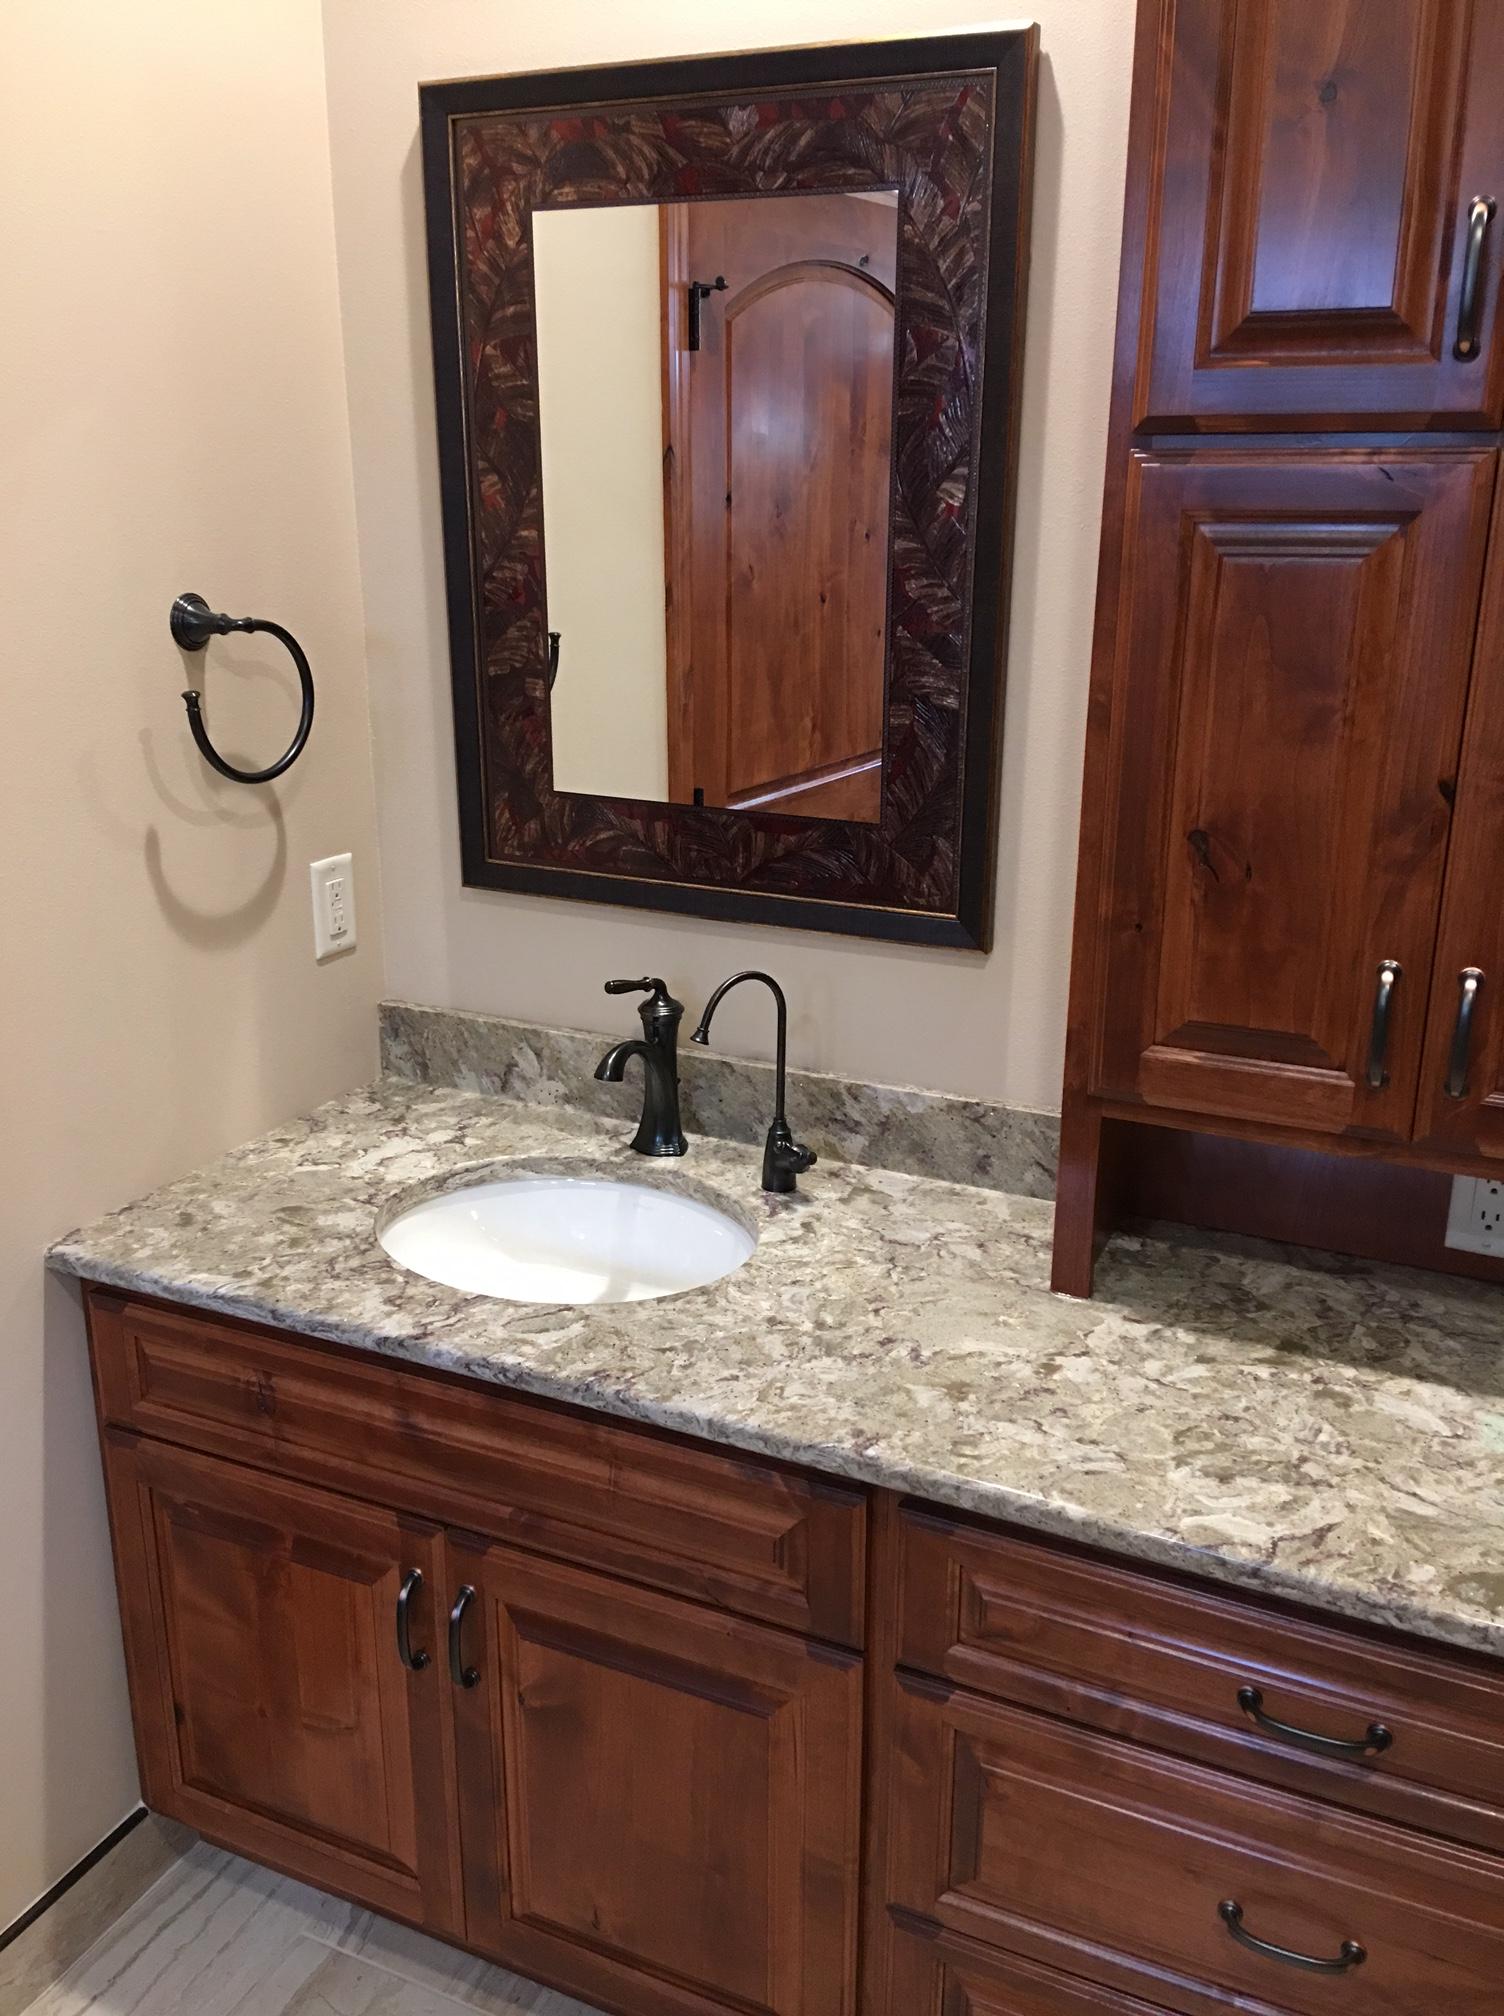 do it yourself kitchen countertops round black table cambria nevern quartz - stone center, sioux falls